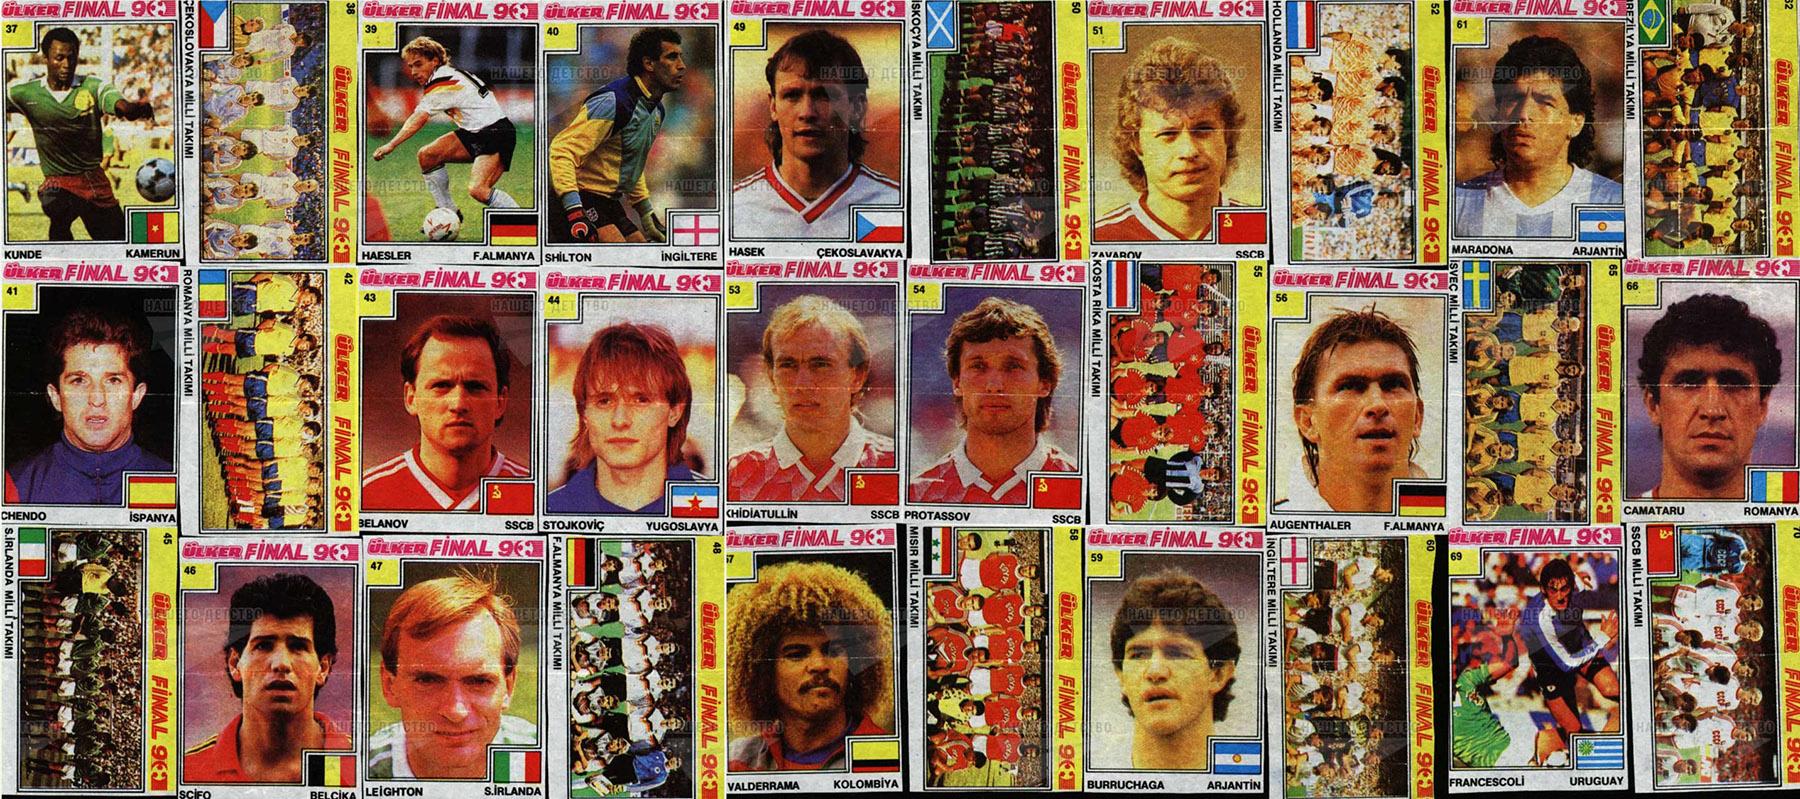 1288033125_davki-kartinki-s-futbolisti-90-final2a.jpg